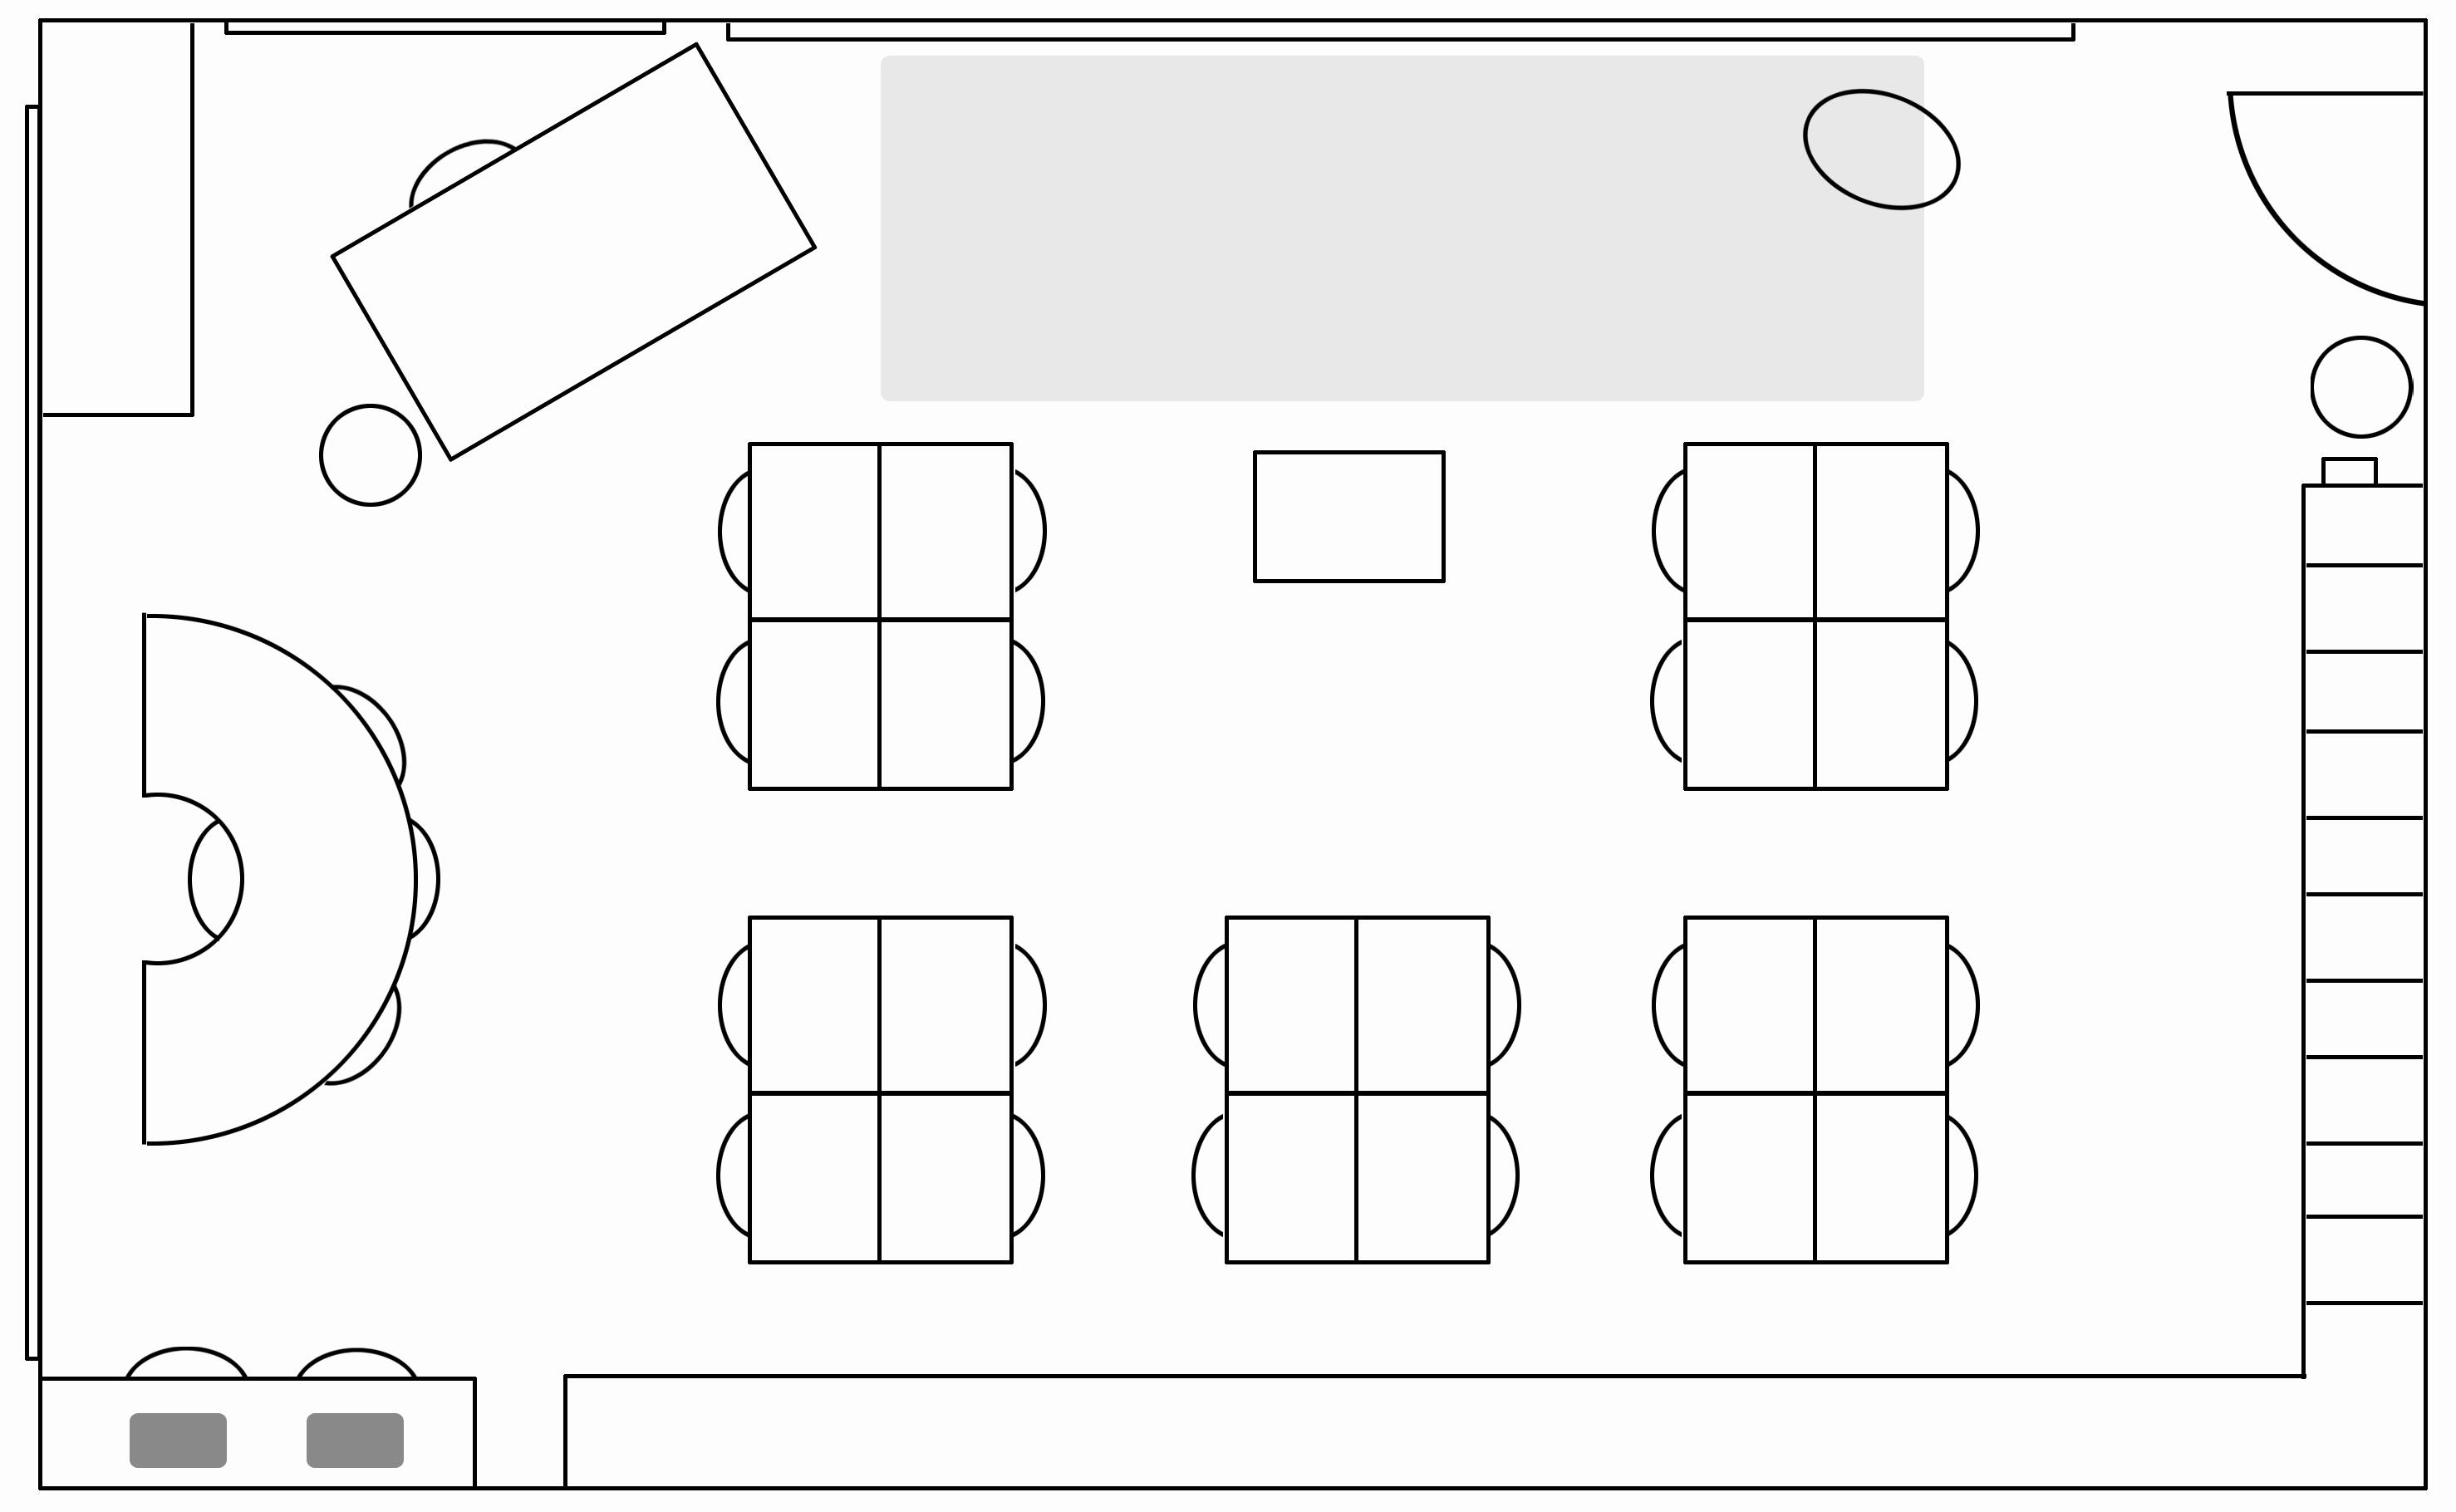 Make Seating Chart Online Free Luxury Free Classroom Seating Chart Maker Portablegasgrillweber